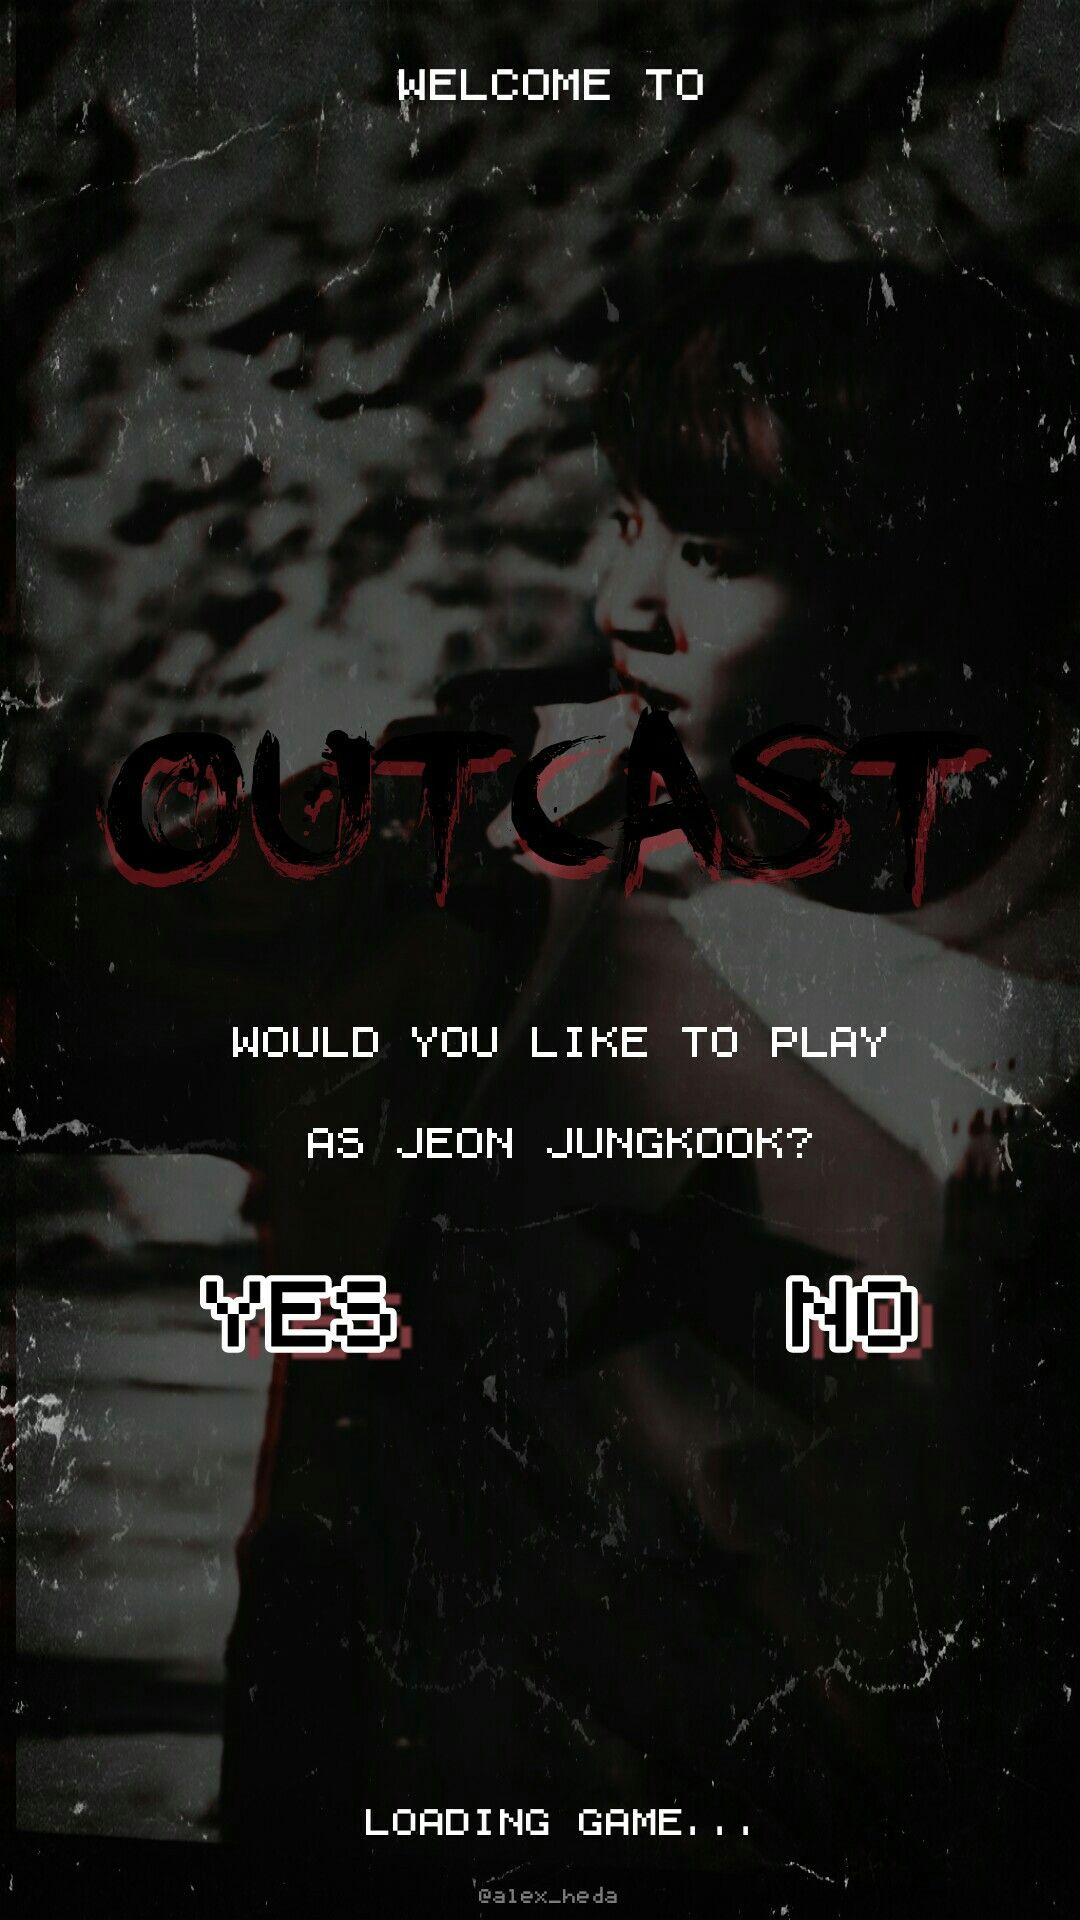 Jungkook Outcast BTS AU Lockscreen #jungkook #bts #outcast